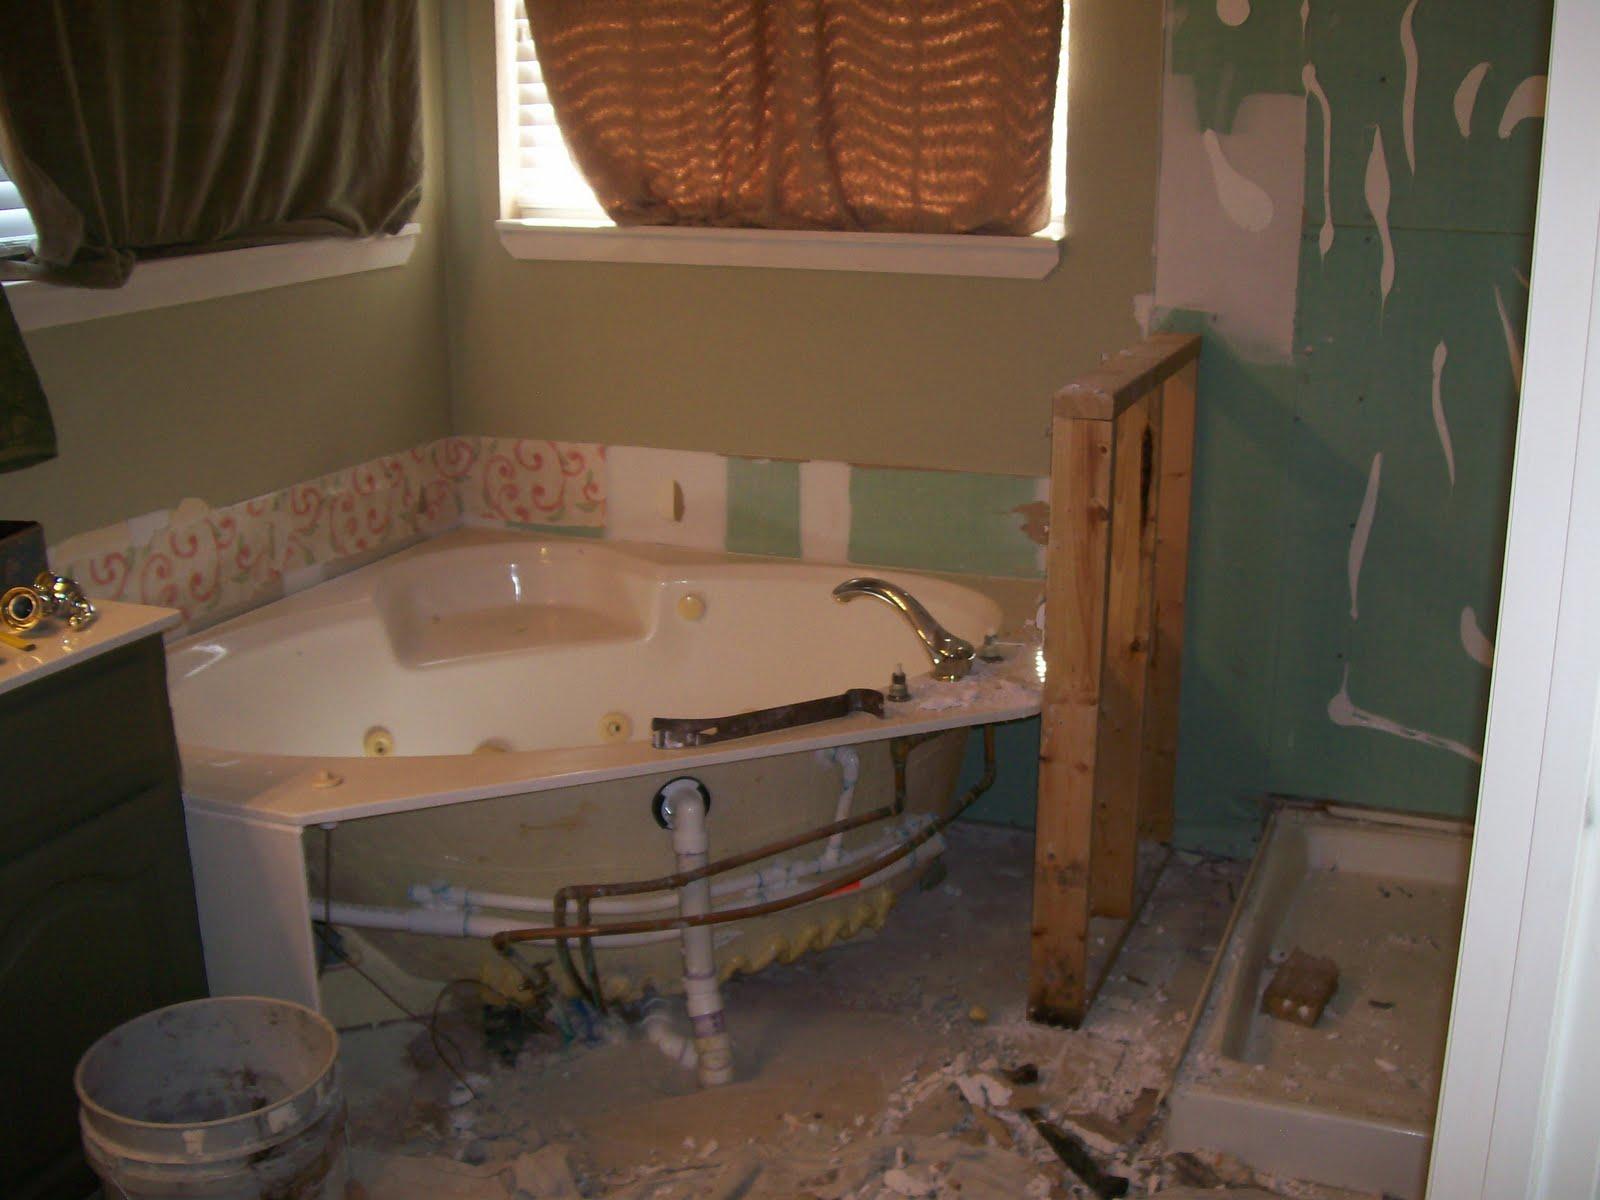 Gemini Bathroom Remodeling October 2010